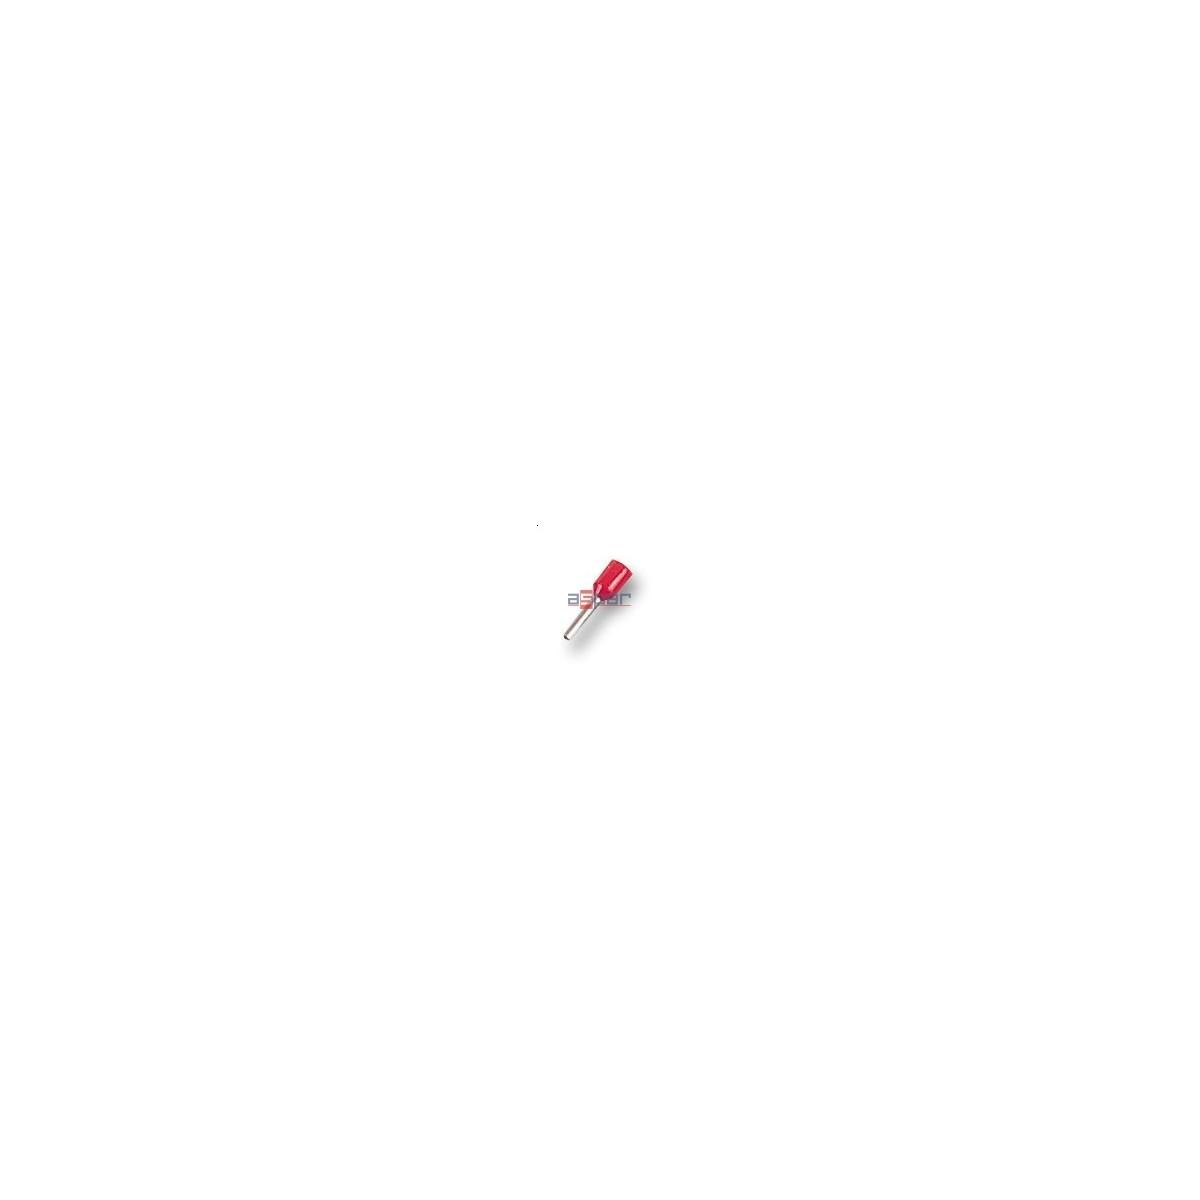 Końcówka tulejkowa, HI 0,5/8